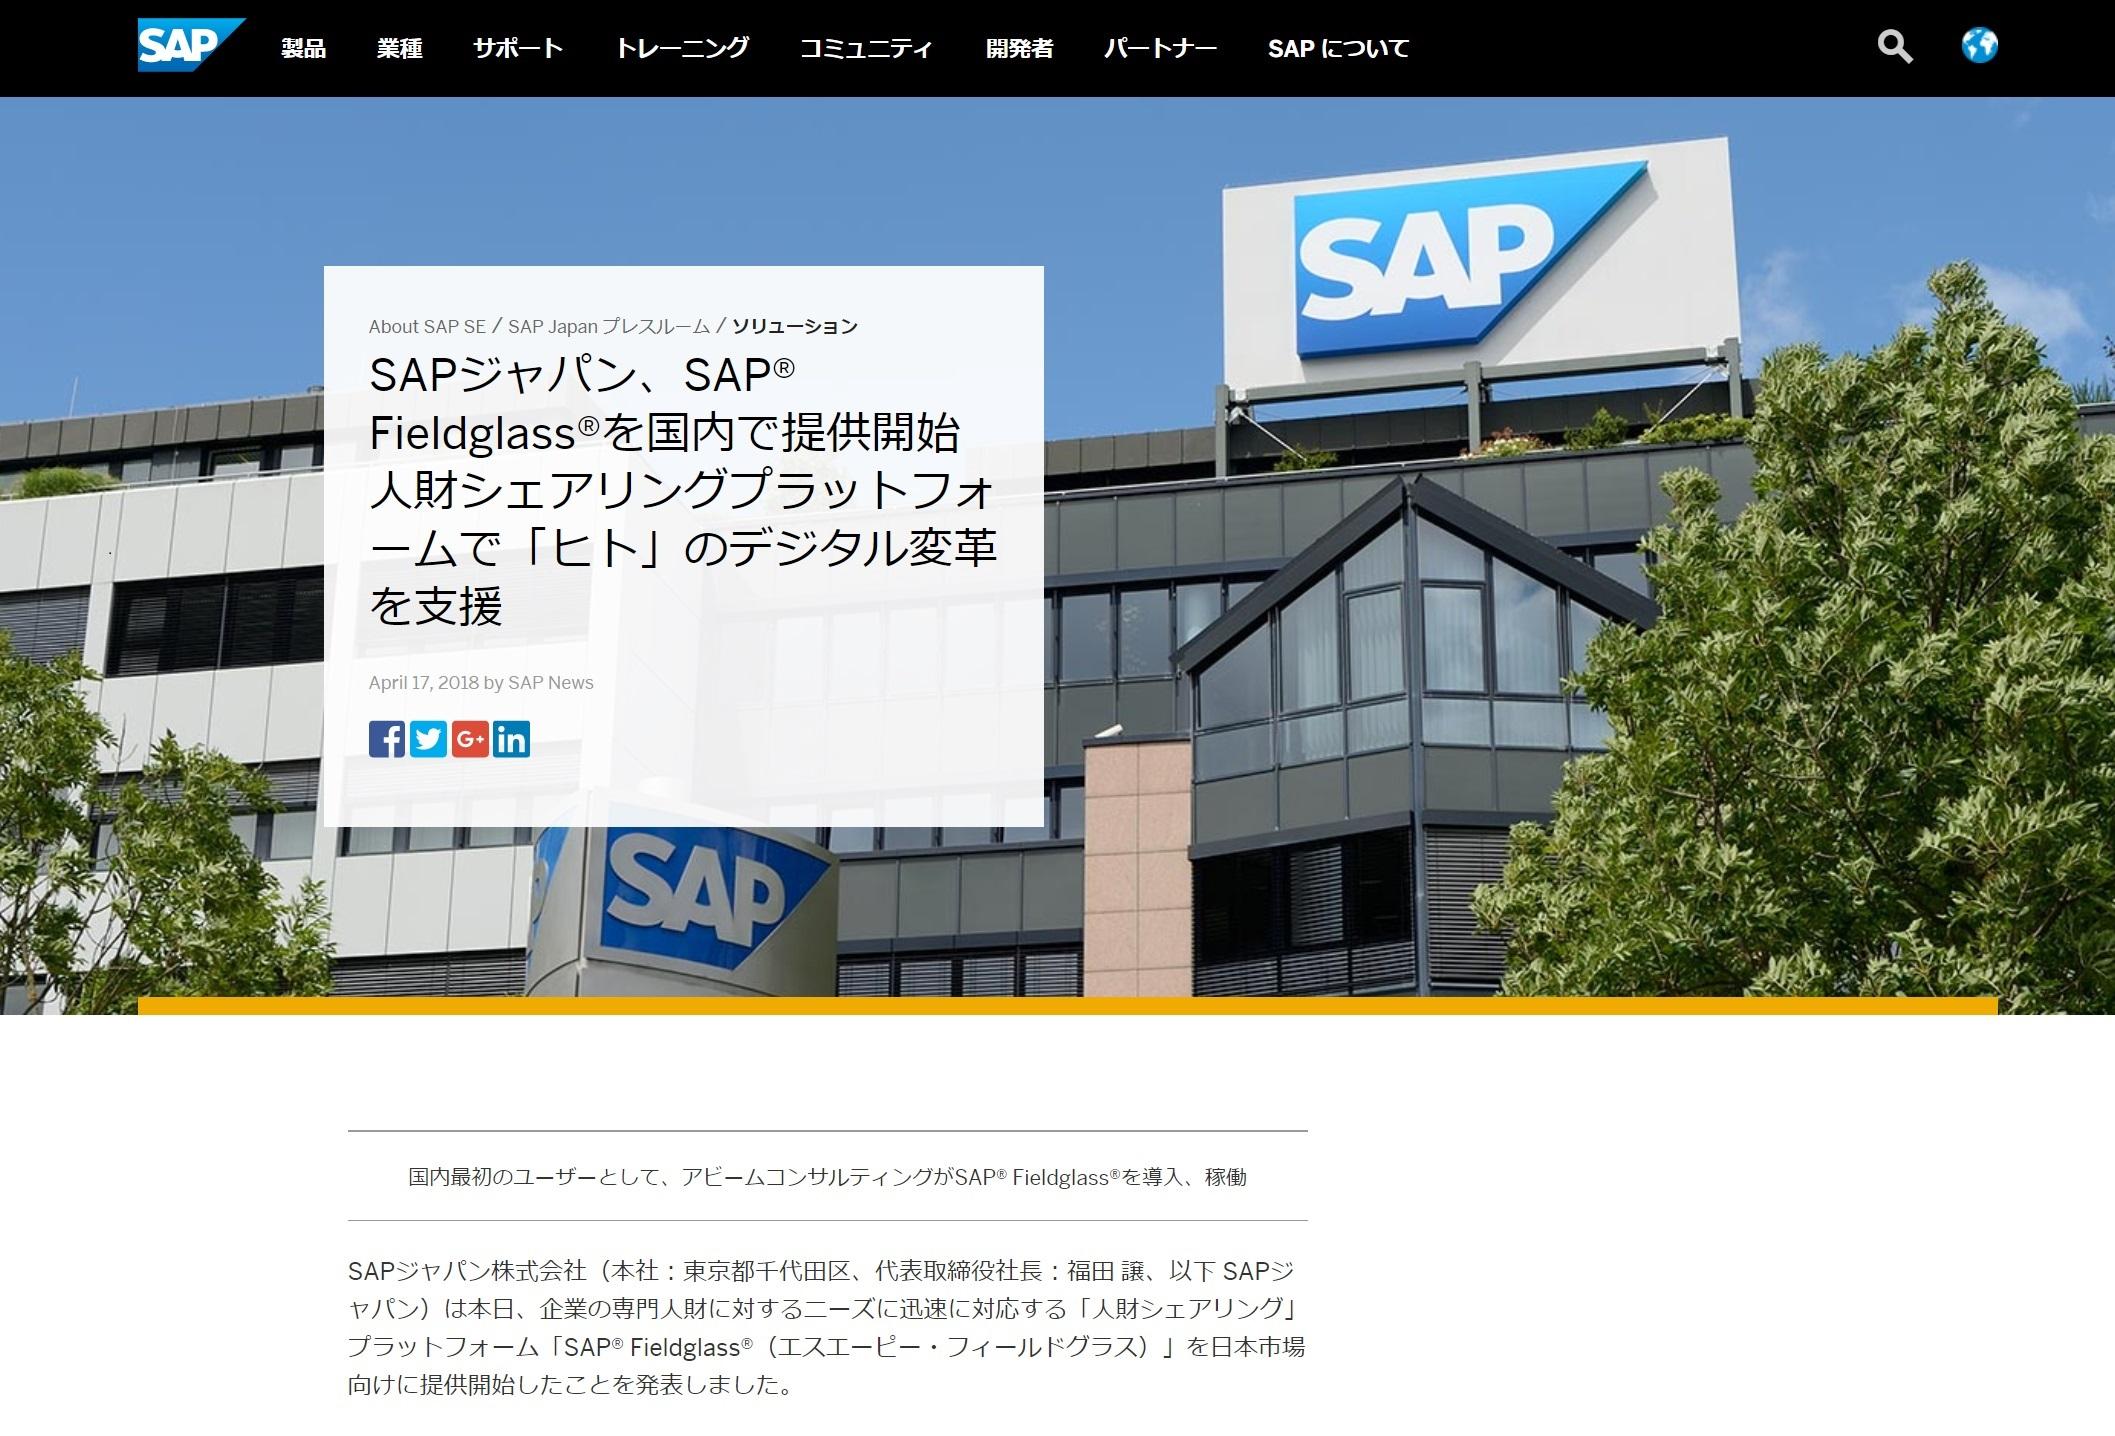 SAPジャパン、人財シェアリングプラットフォーム「SAP Fieldglass」を提供開始。「ヒト」のデジタル変革を支援